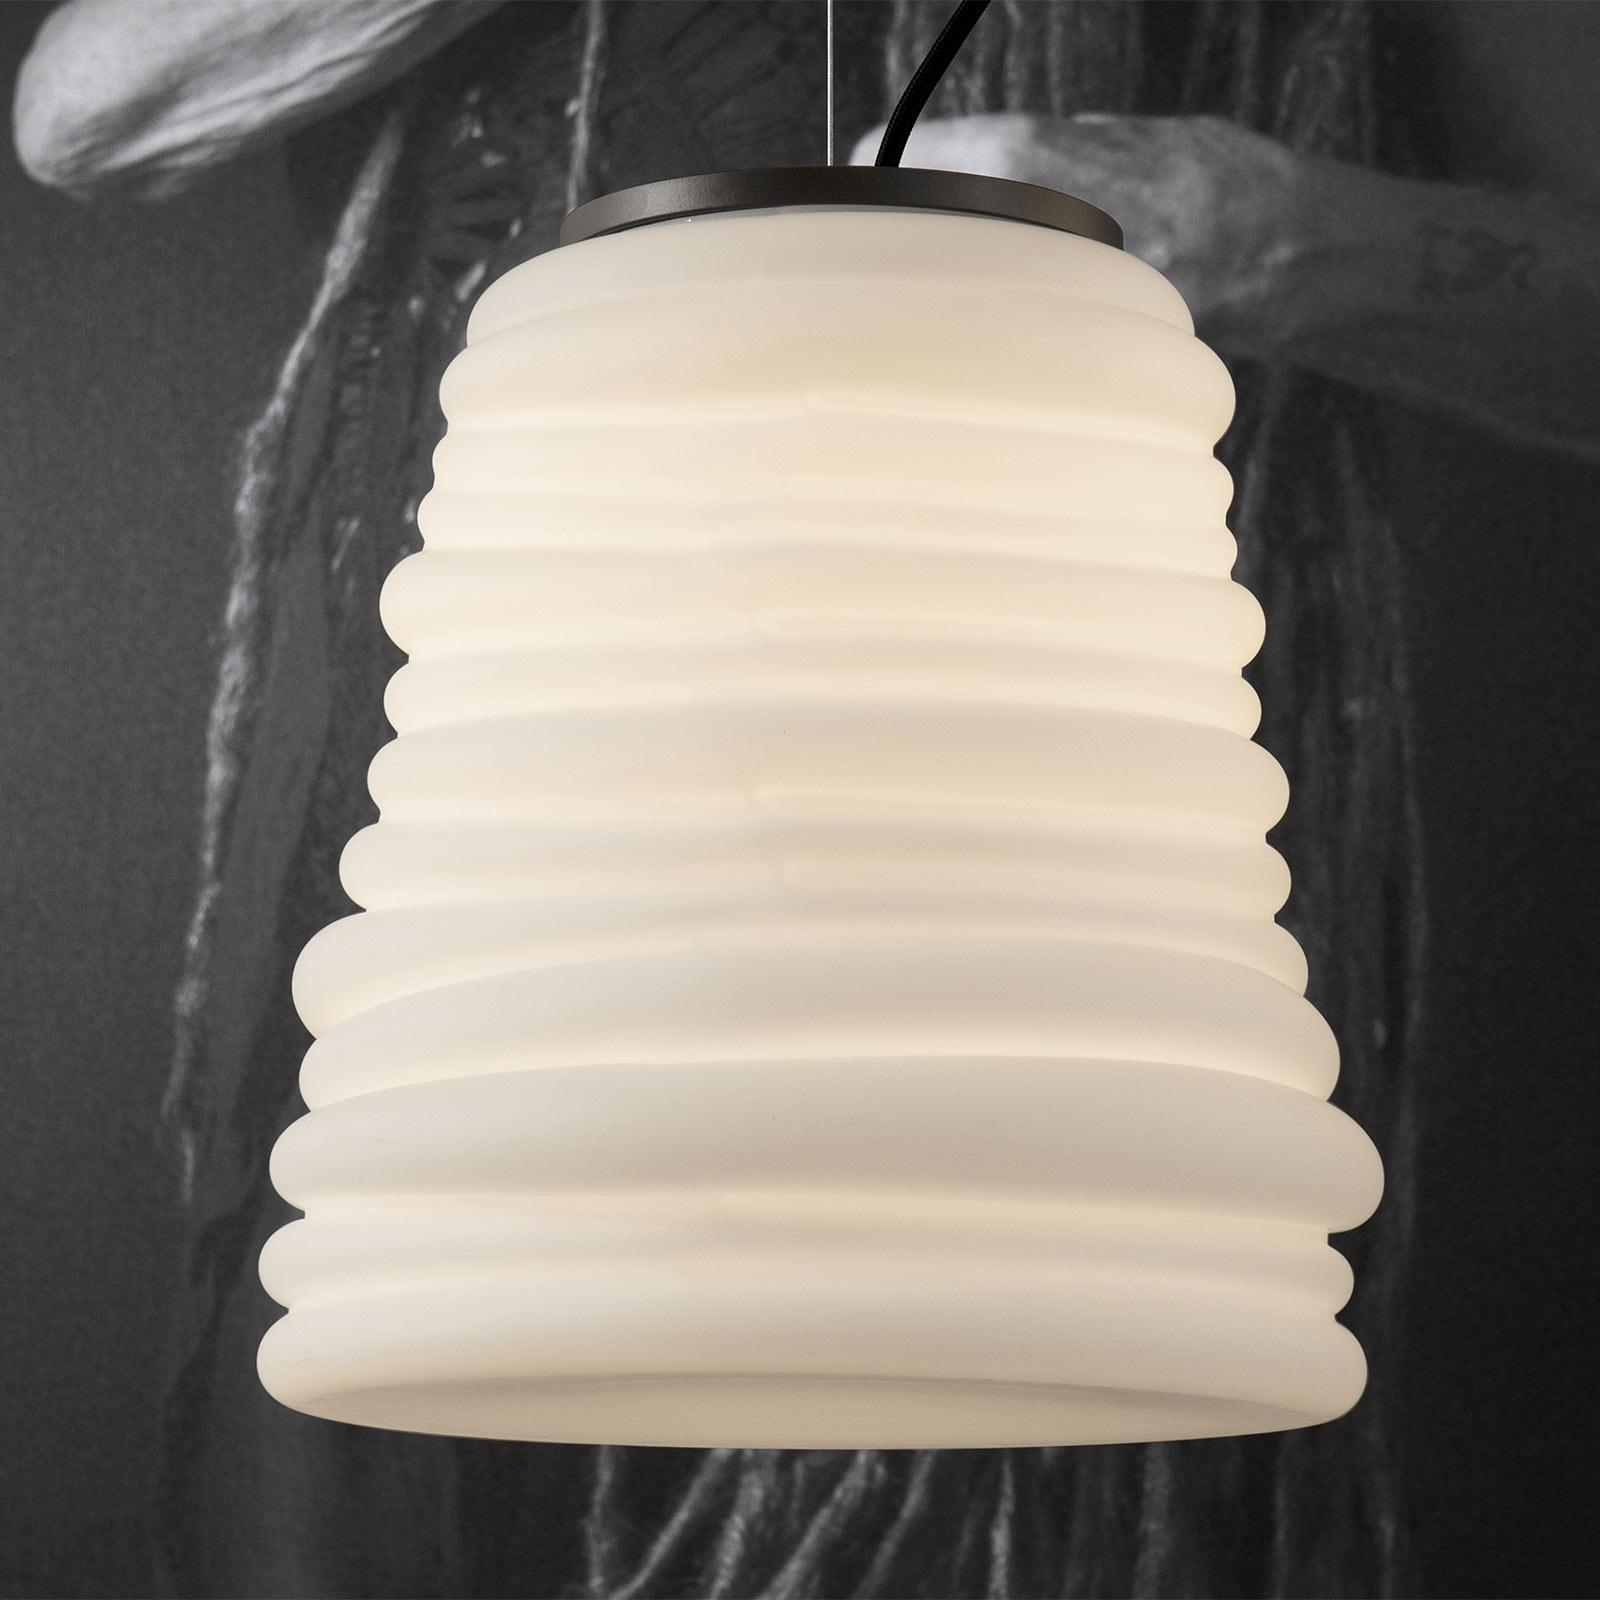 Karman Bibendum suspension LED, Ø 30cm, blanche